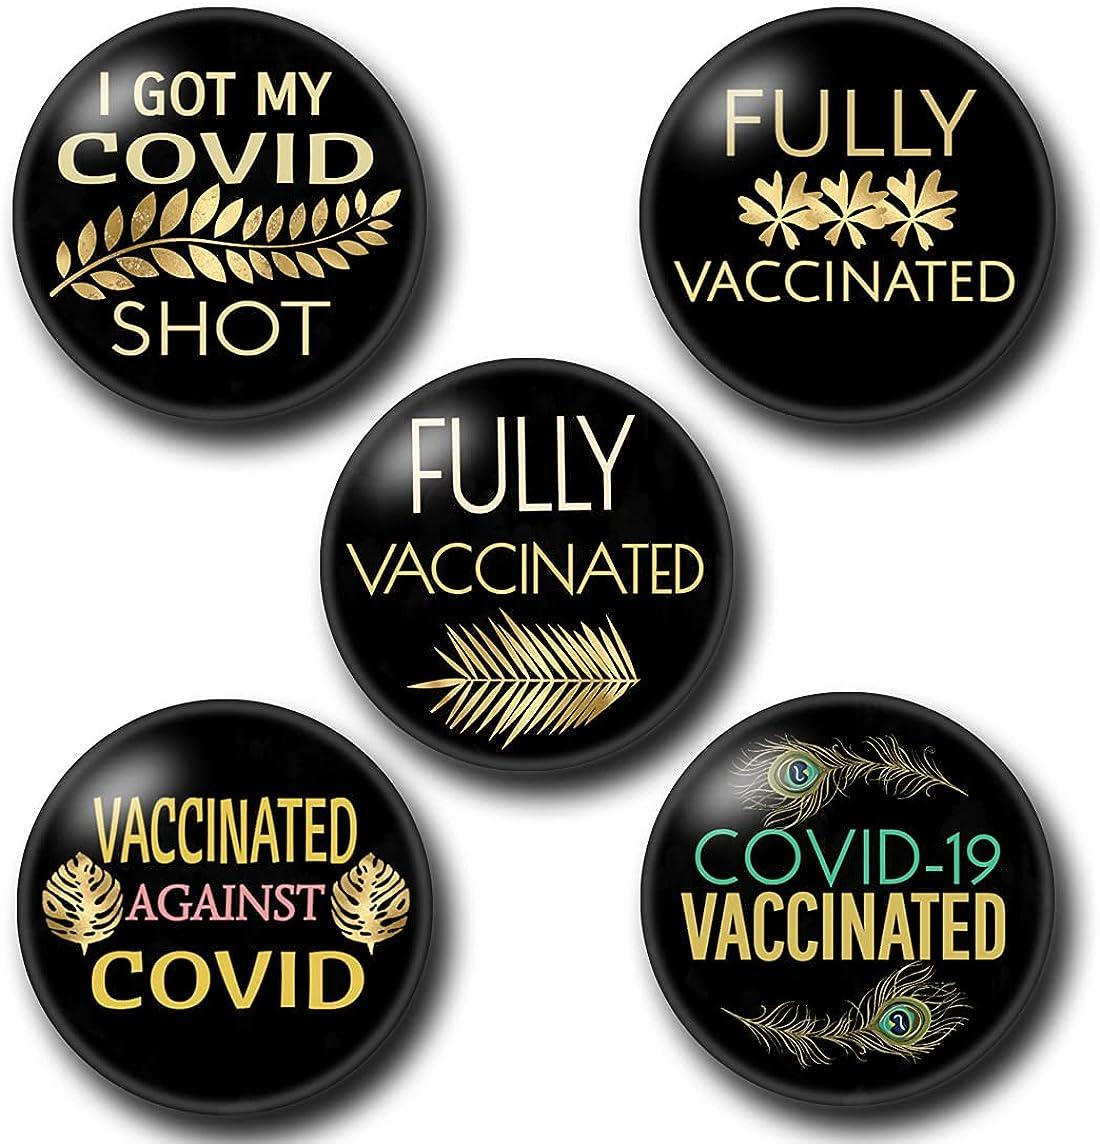 COVID Fresno Mall Vaccinated Pins 5 buttons Fashion Covid-19 Bu pinback